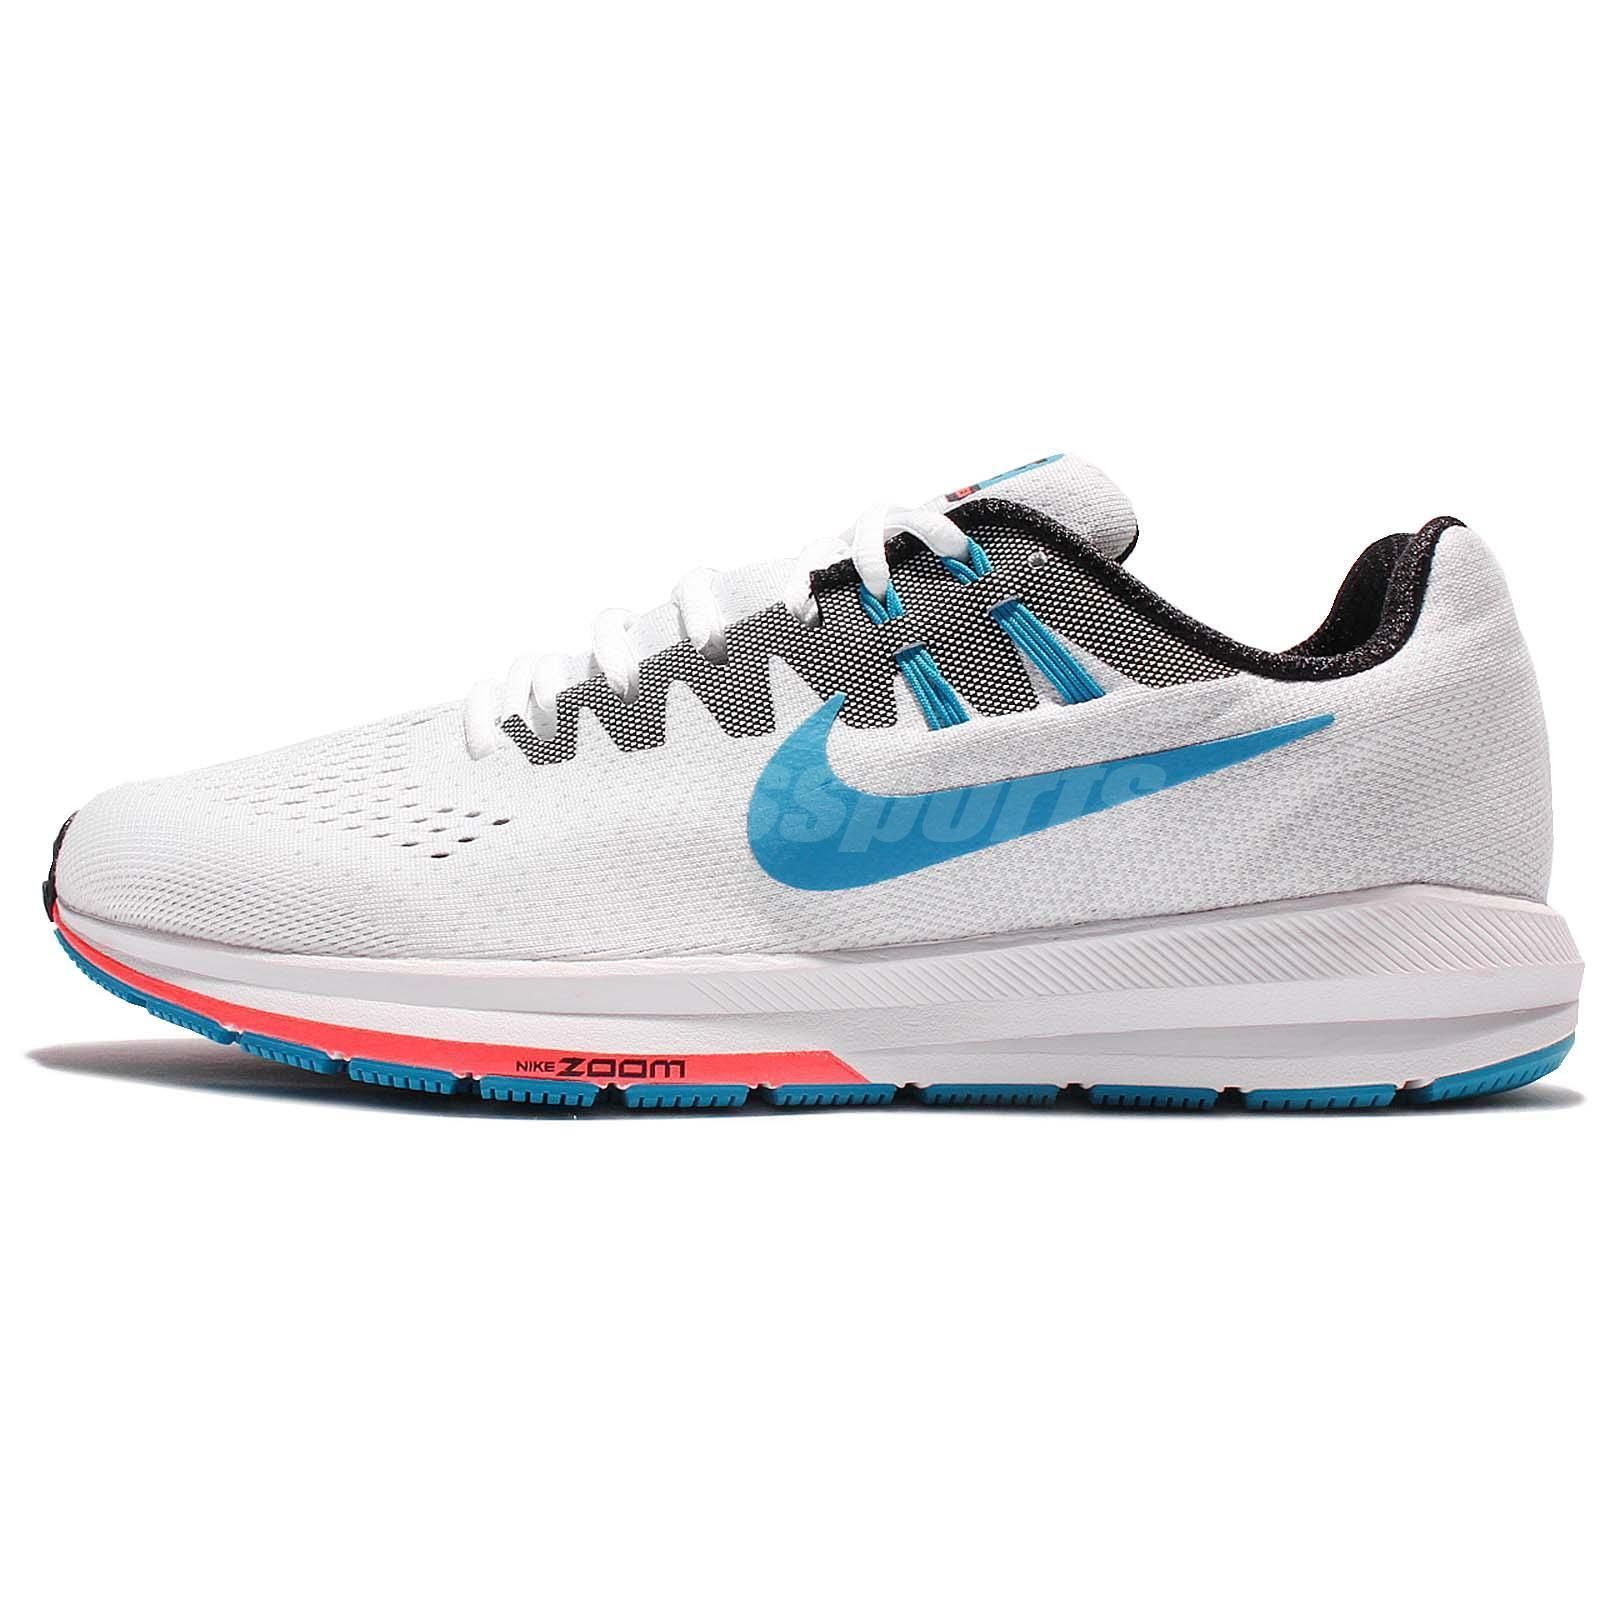 b1d0de44b0964 Nike Air Zoom Structure 20 Anniversary White Blue Men Running Shoes  849580-100